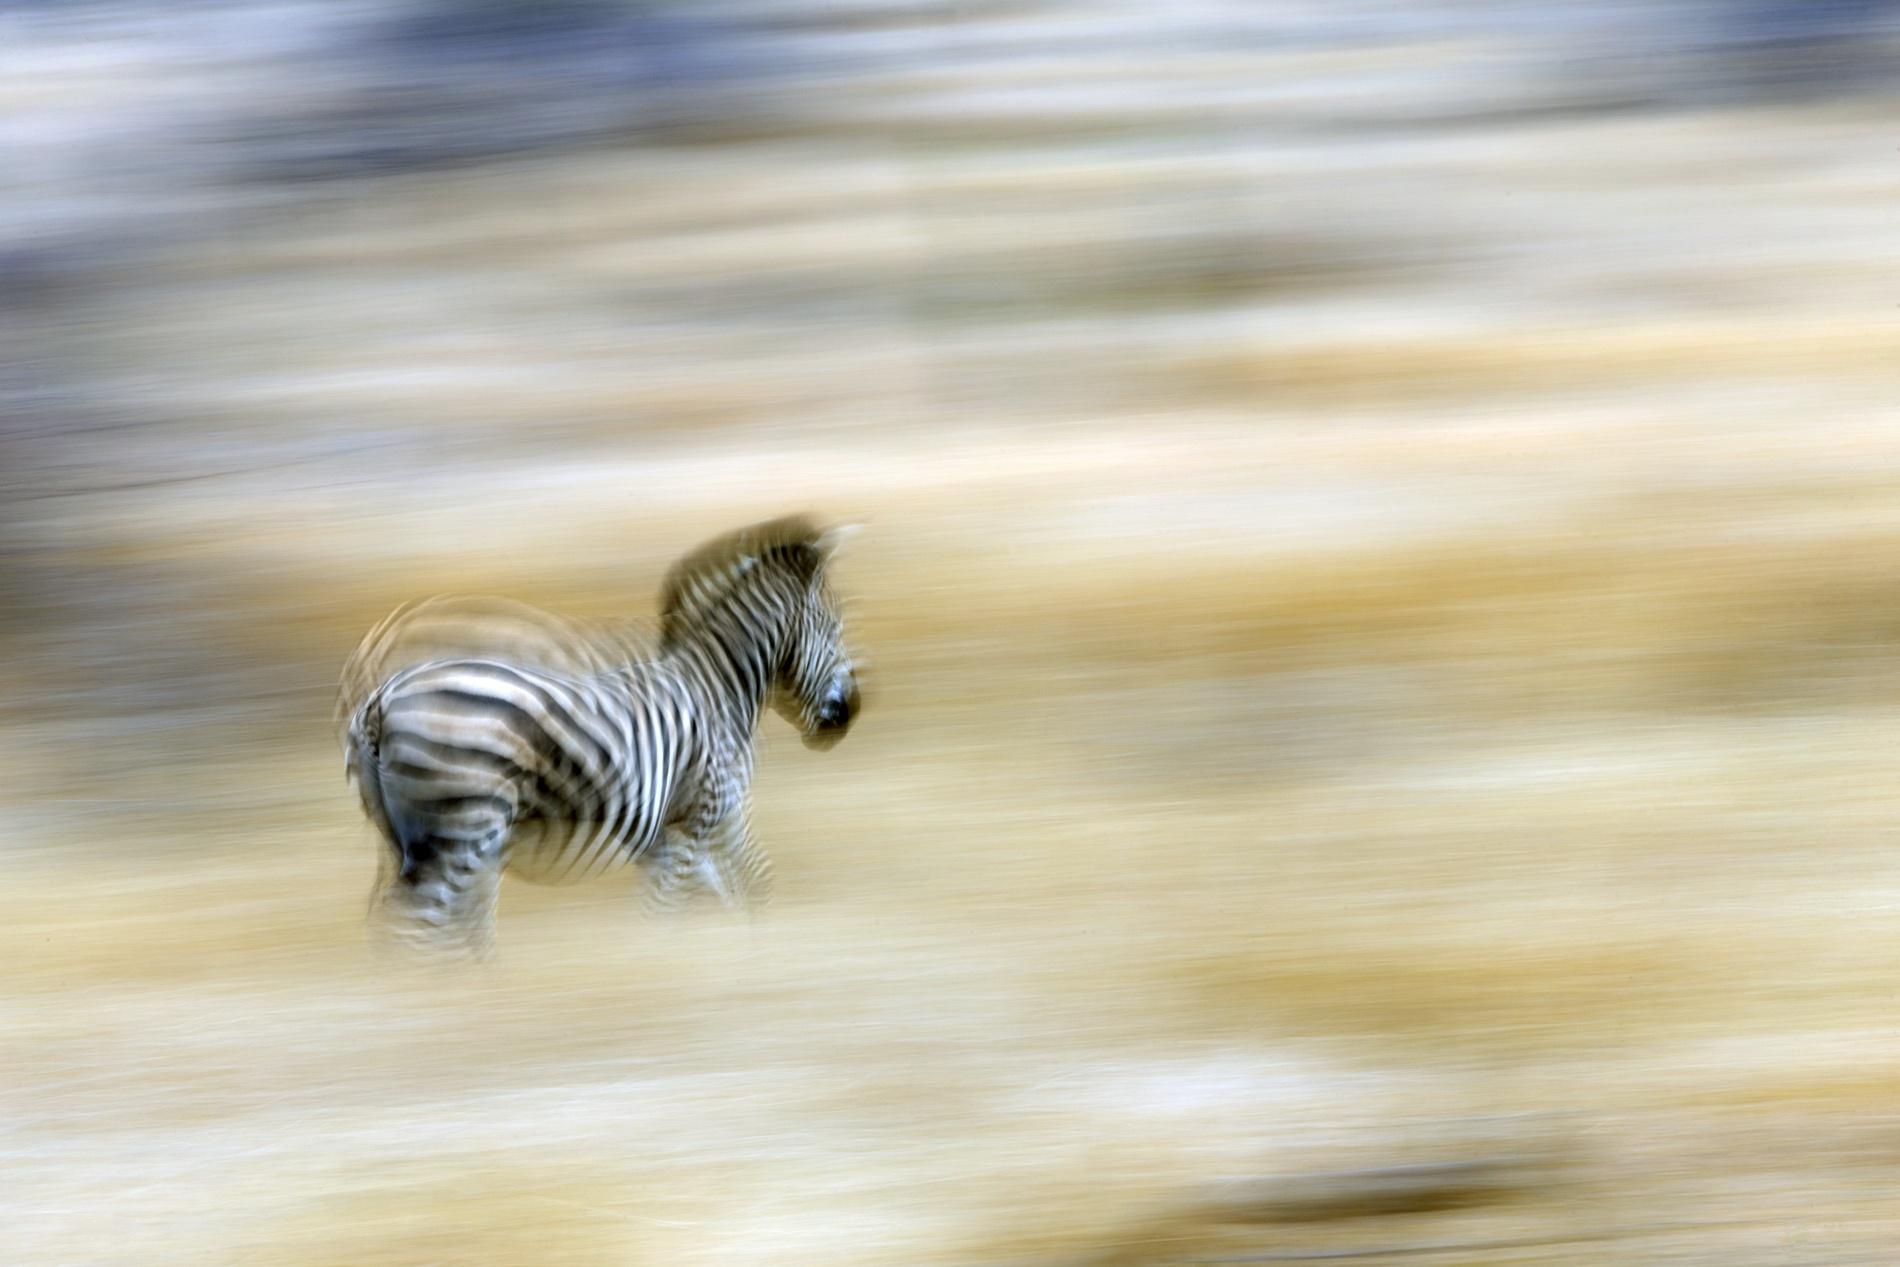 Fauna - David Santiago, Landscape Photography